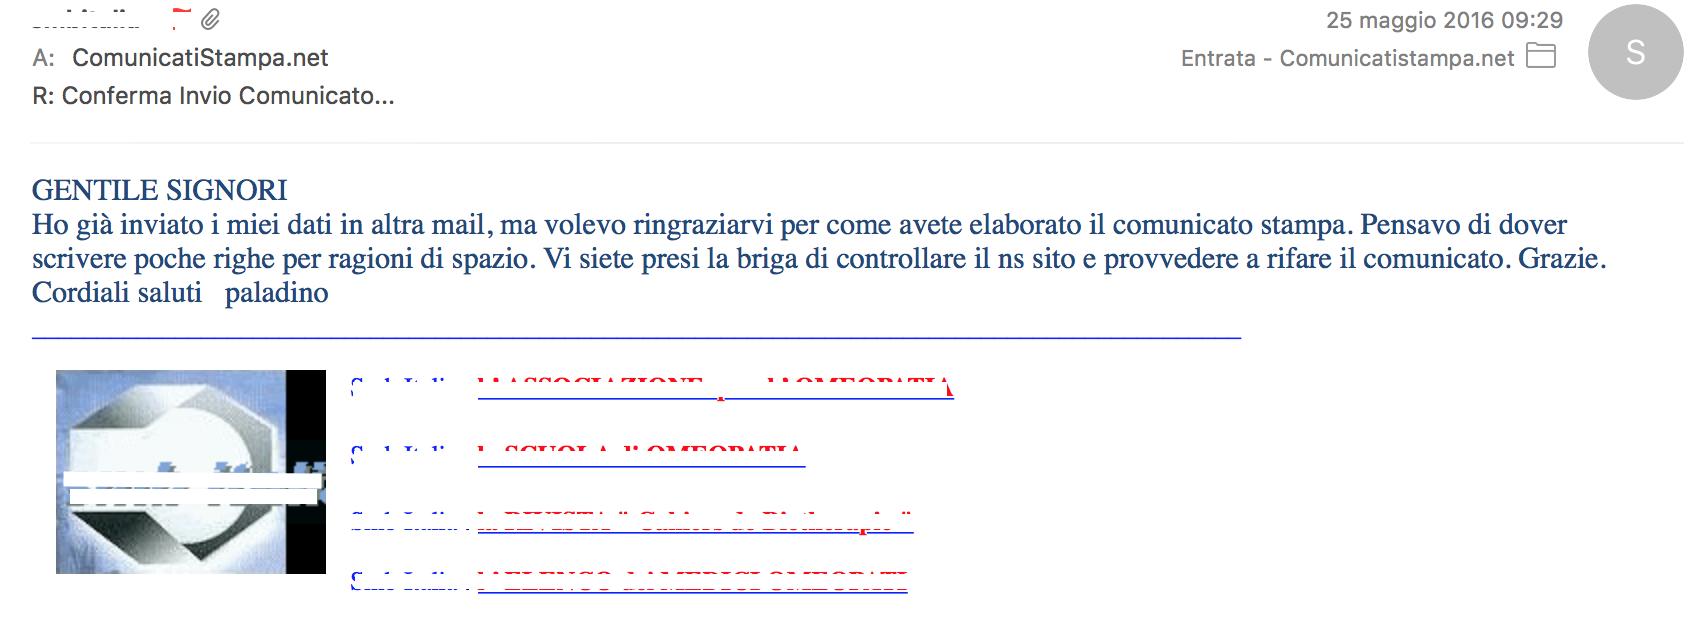 recensione-cliente-comunicatistampa-net